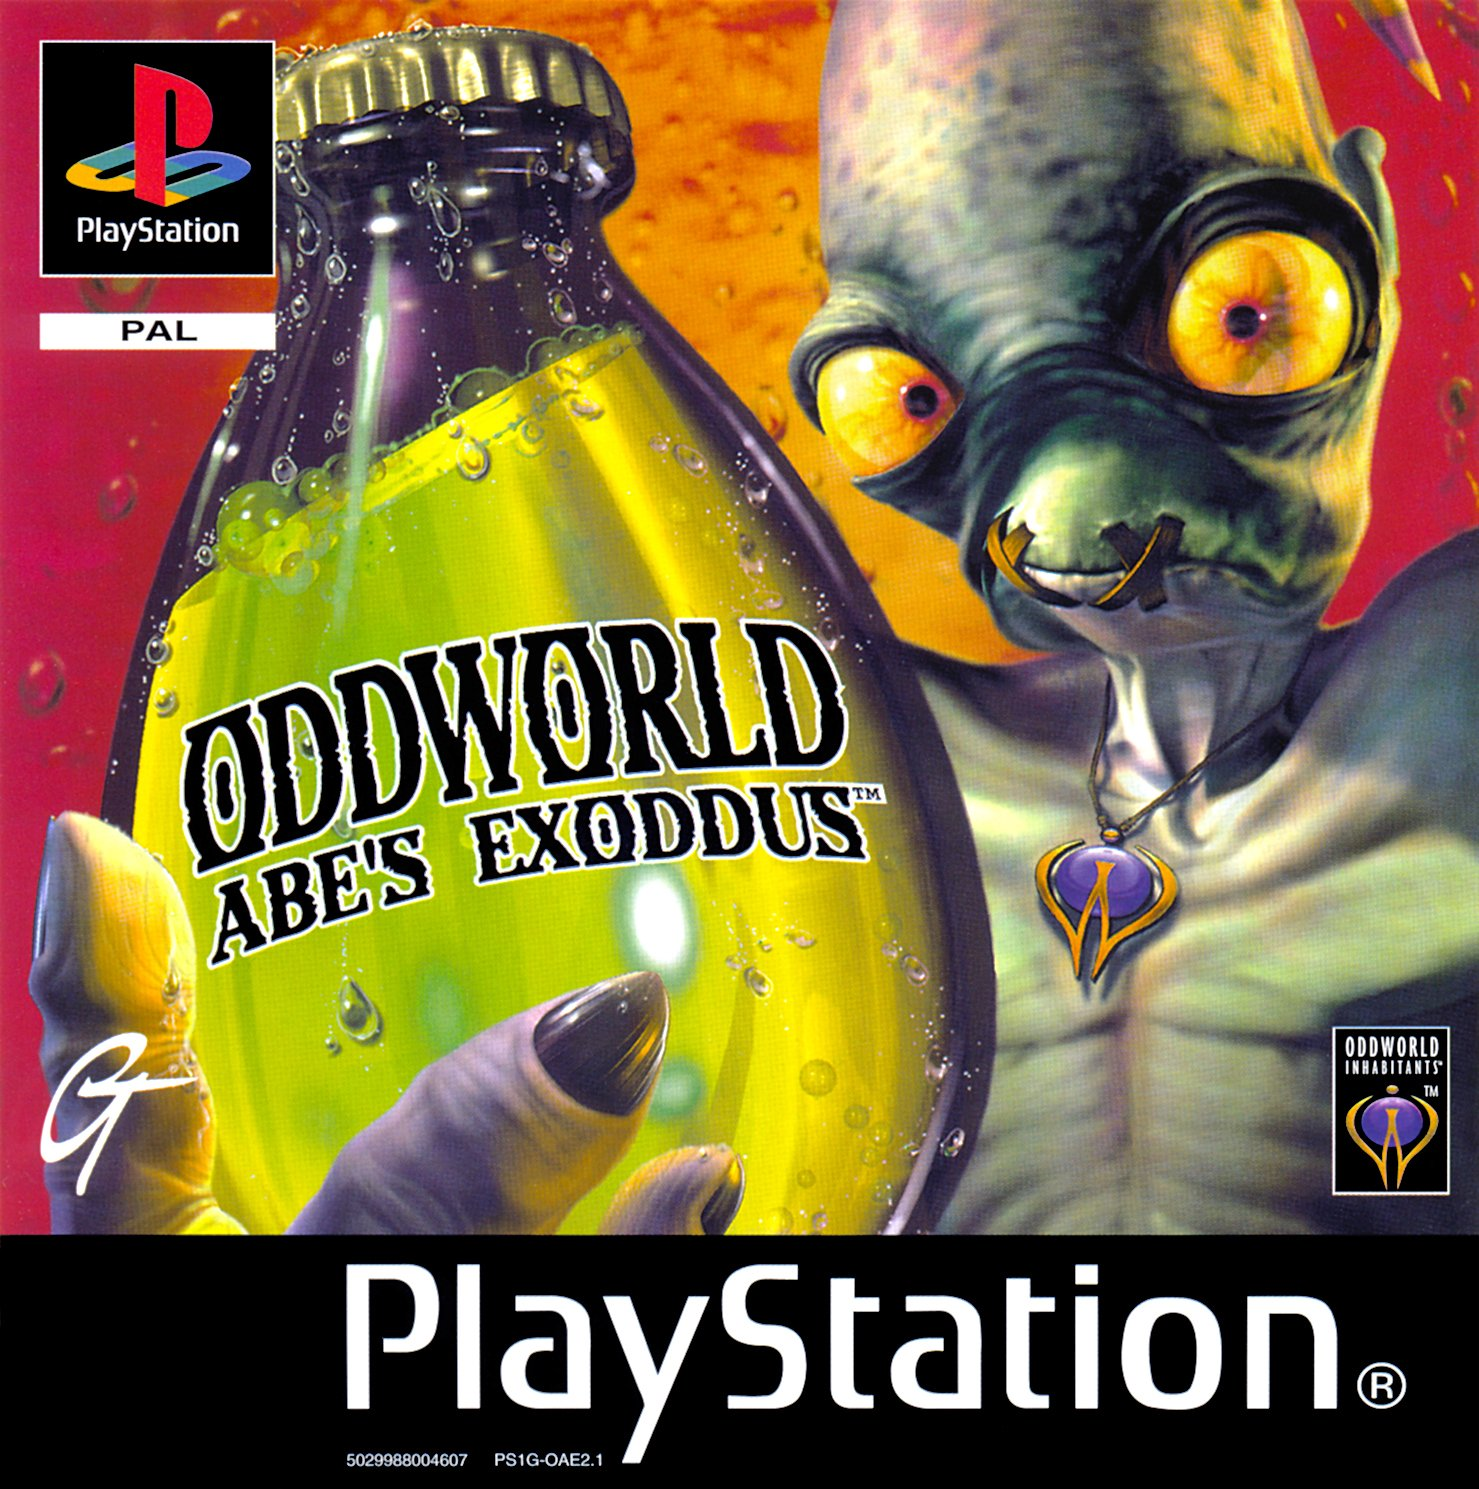 Oddworld - Abe's Exoddus PSX cover